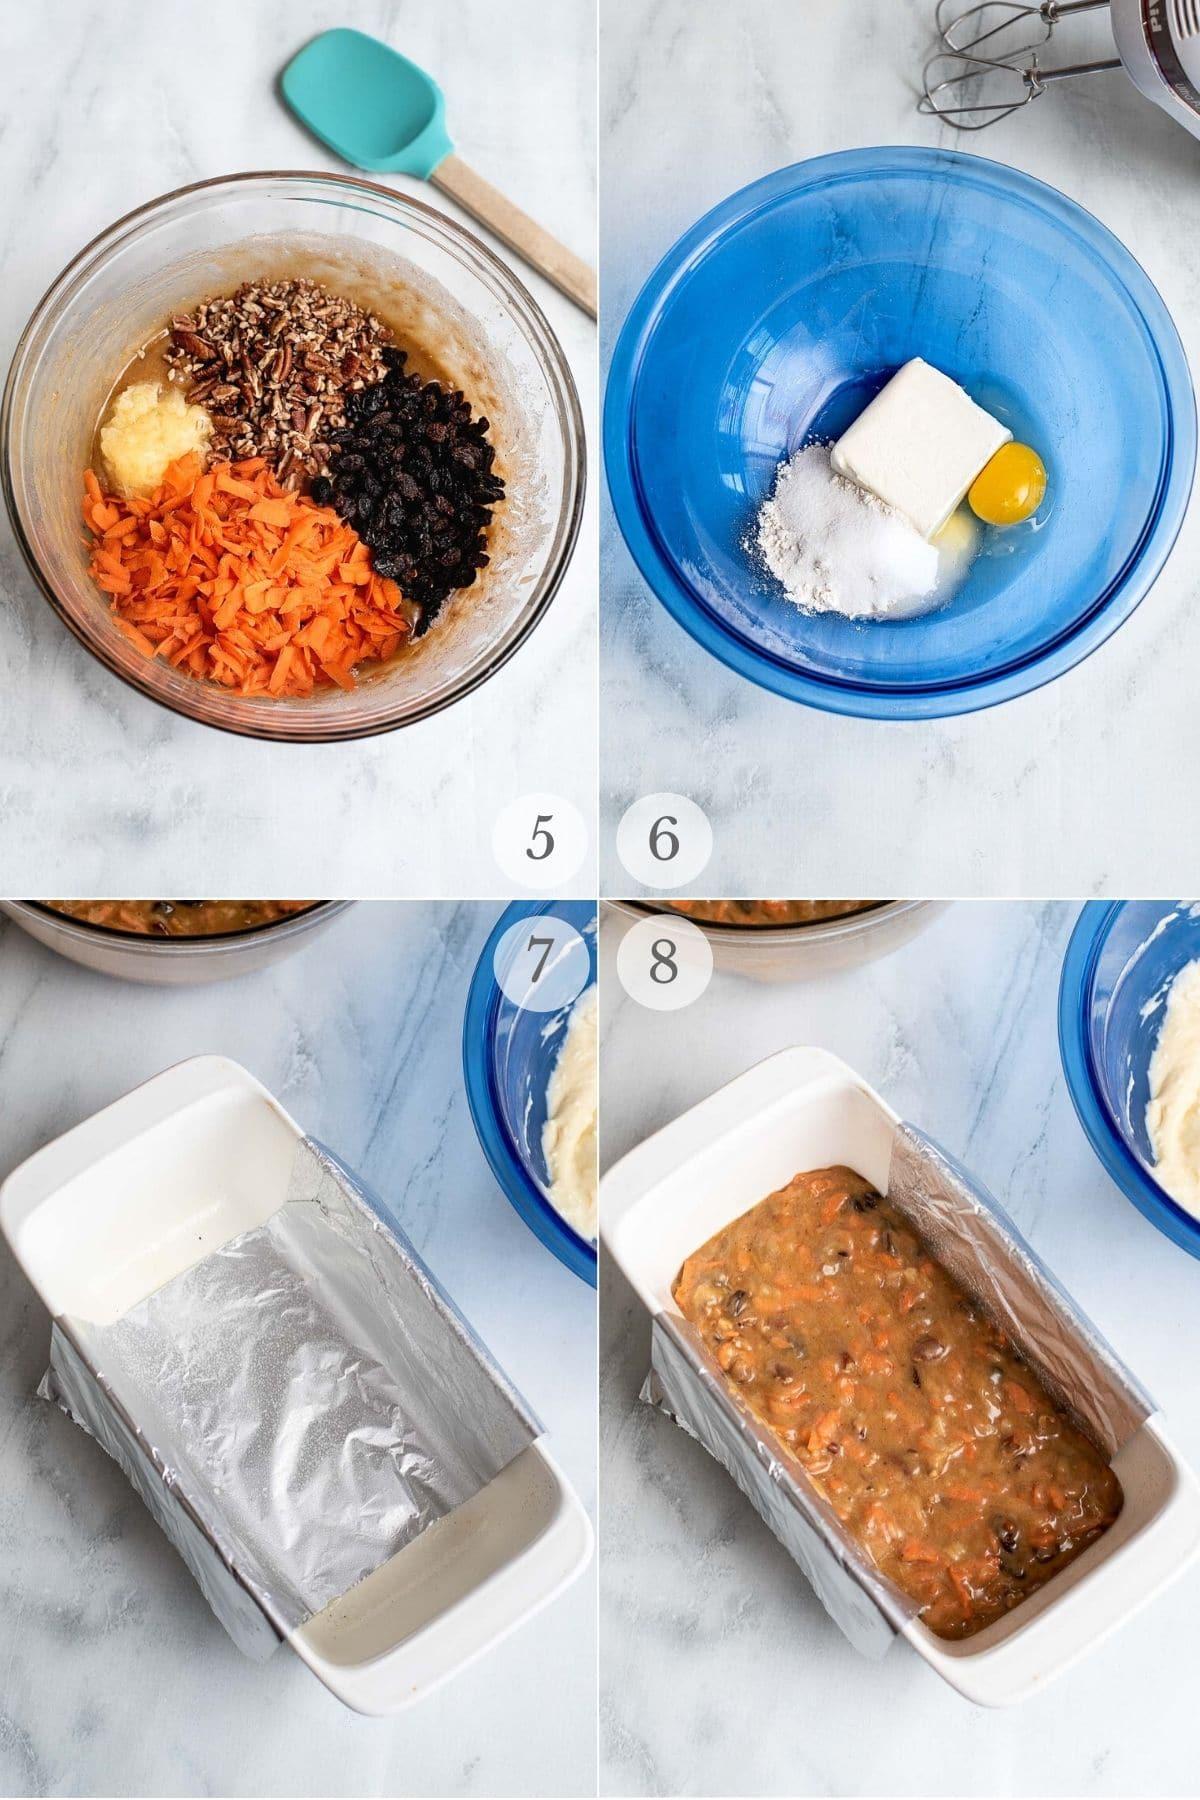 carrot loaf cake recipe steps 5-8